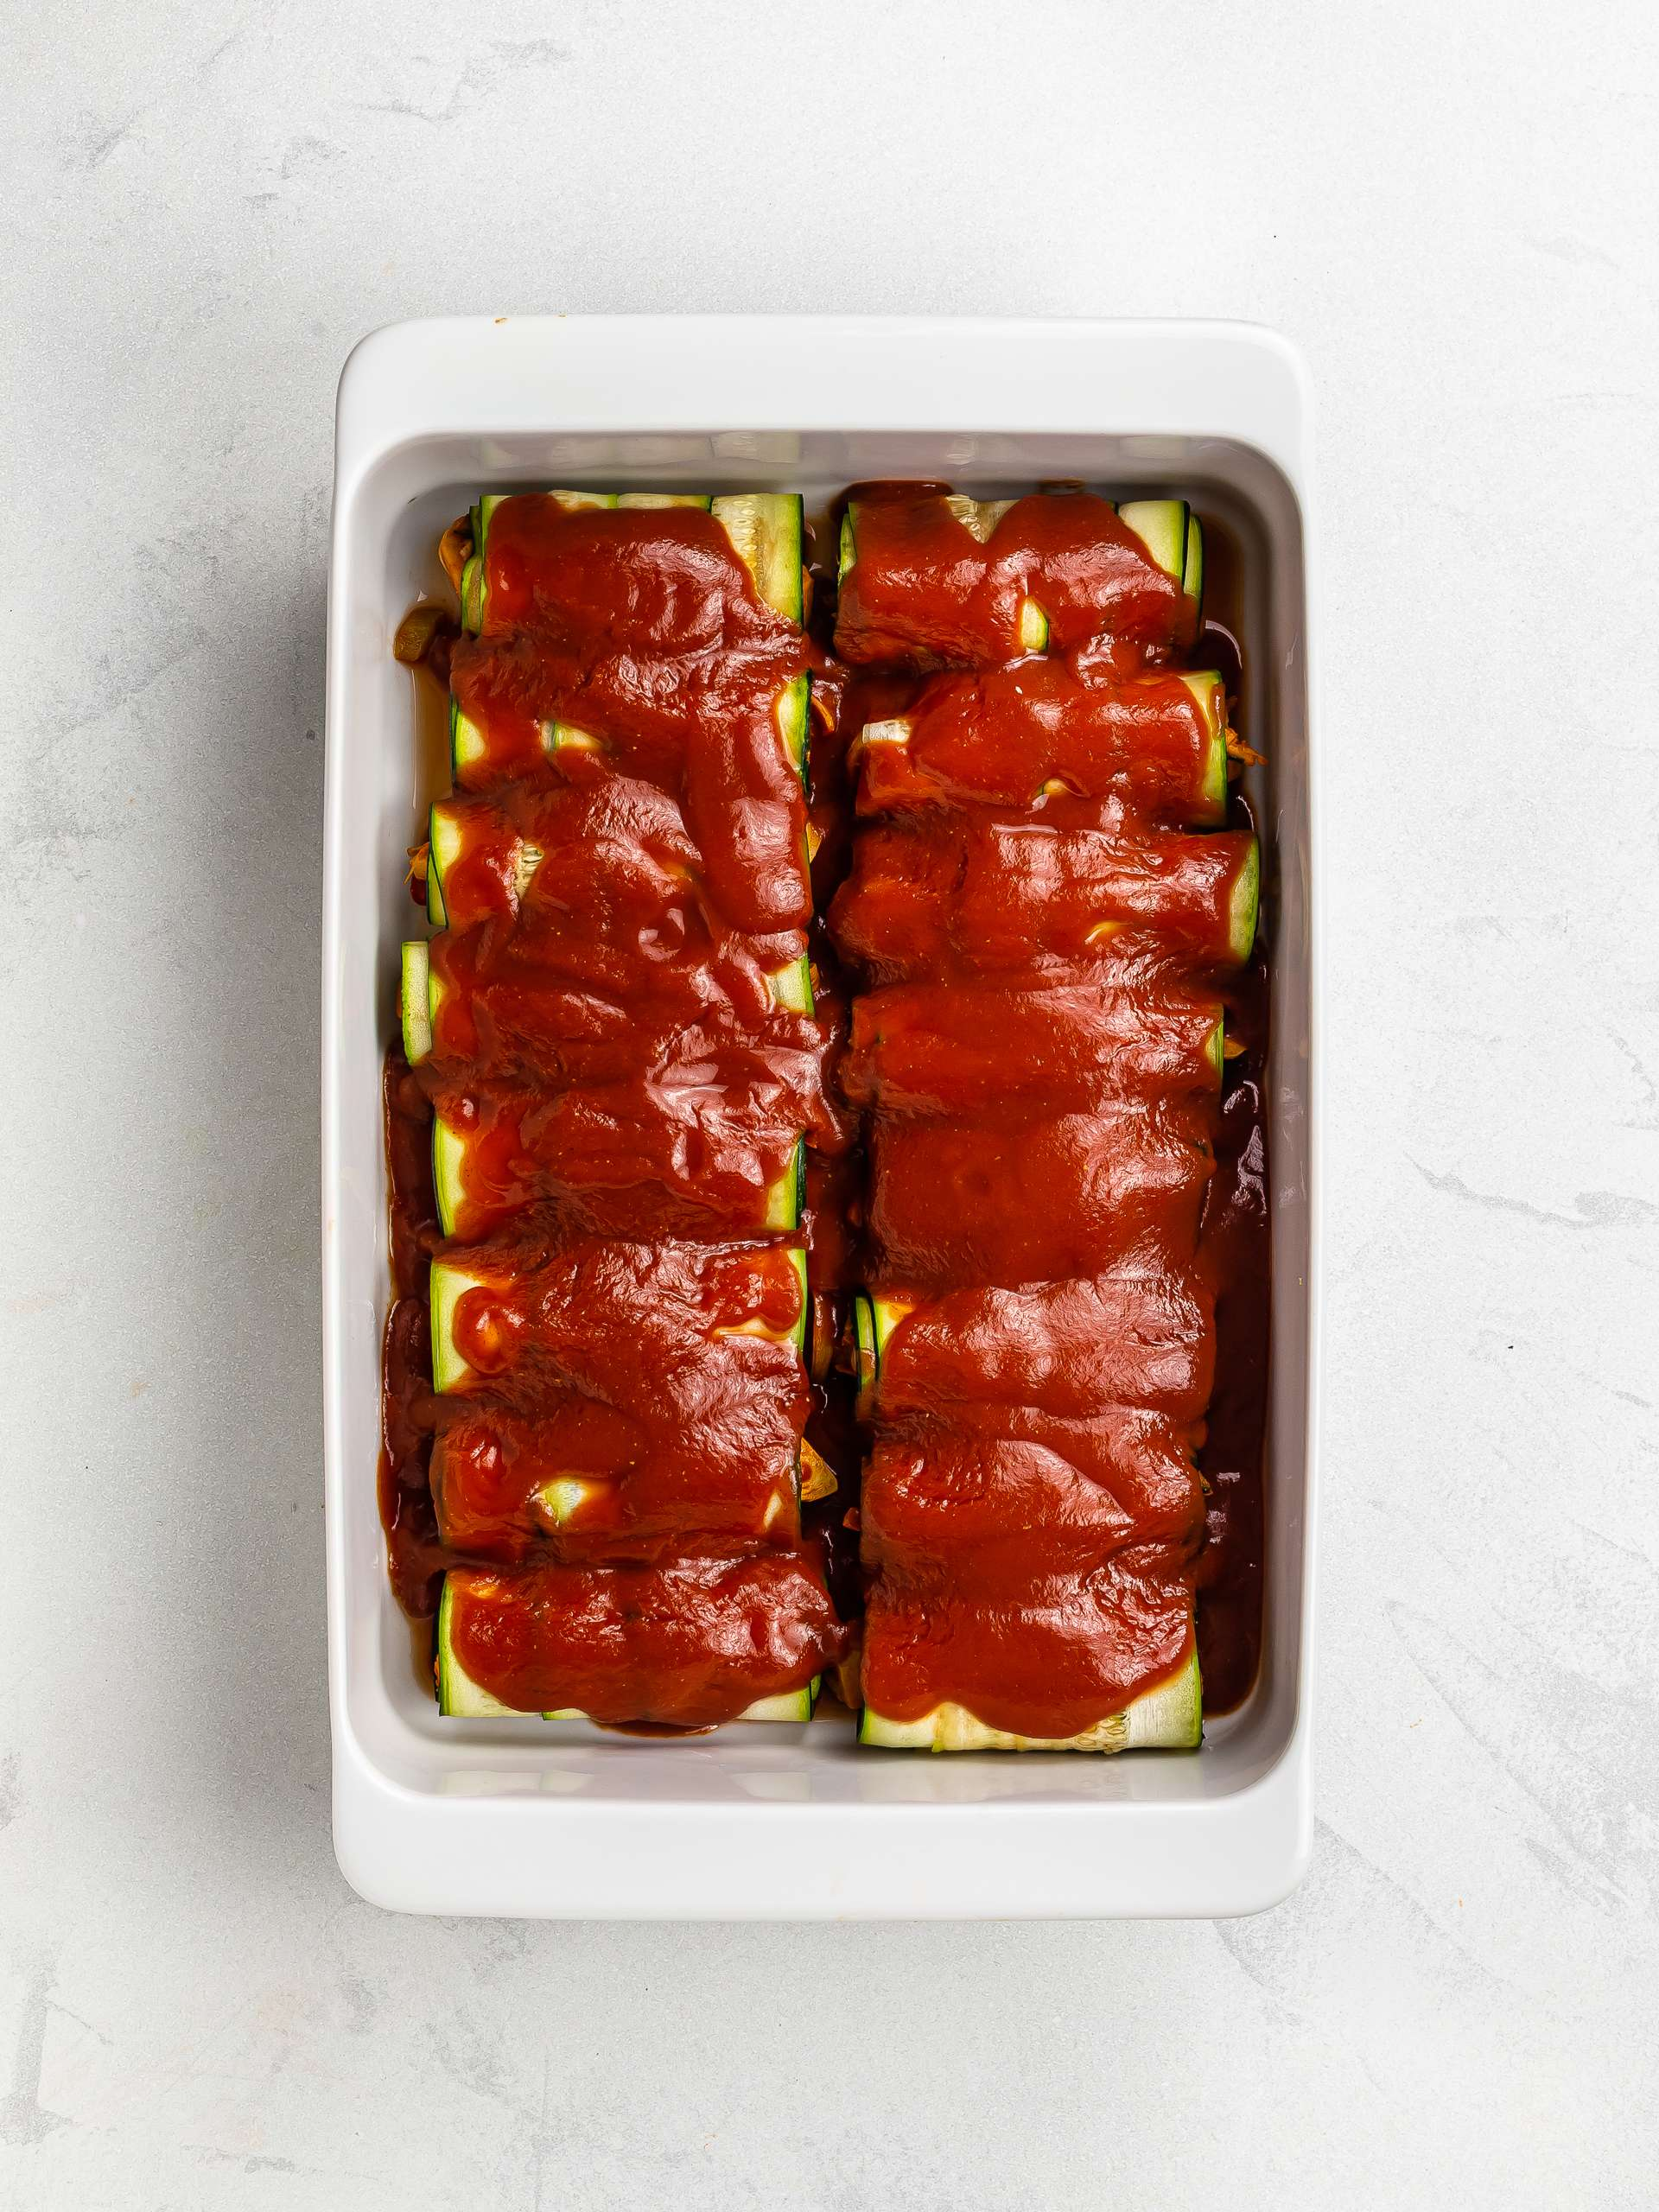 zucchini enchiladas in a casserole dish topped with tomato sauce